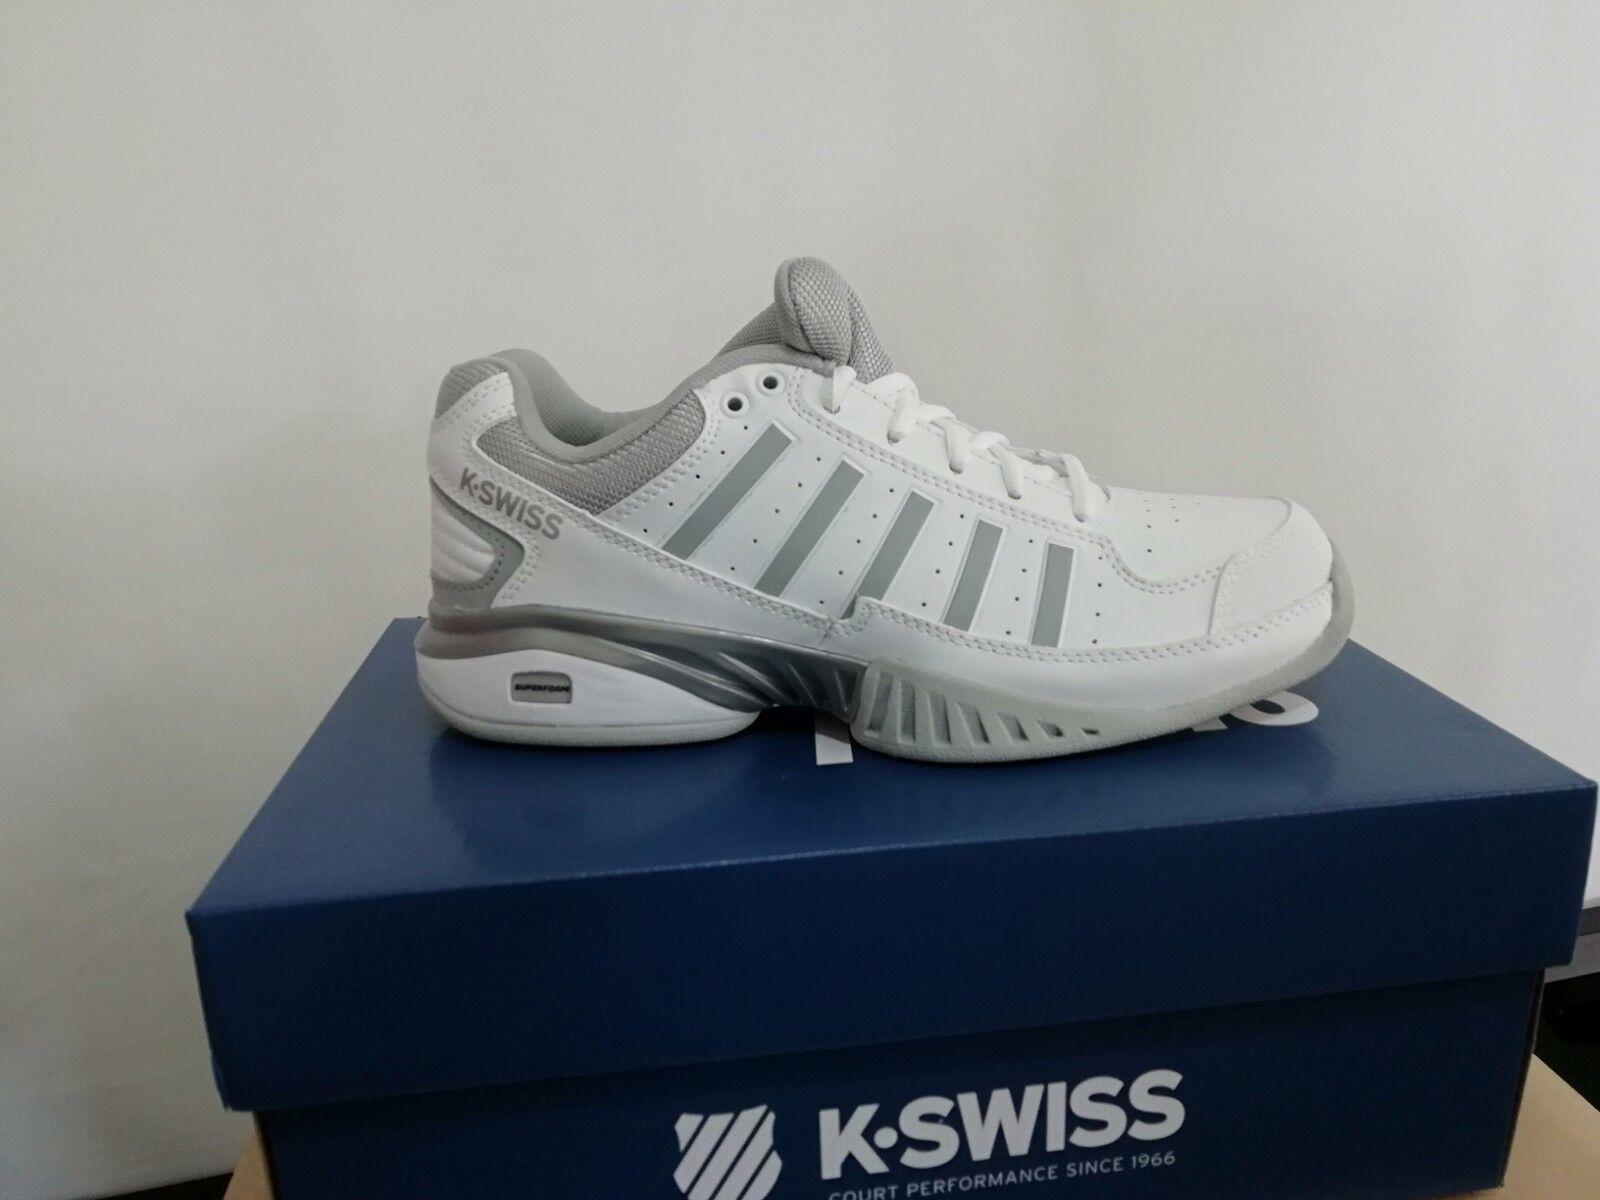 Damen Tennishallenschuh K-Swiss K-Swiss K-Swiss Receiver Carpet 5411ab